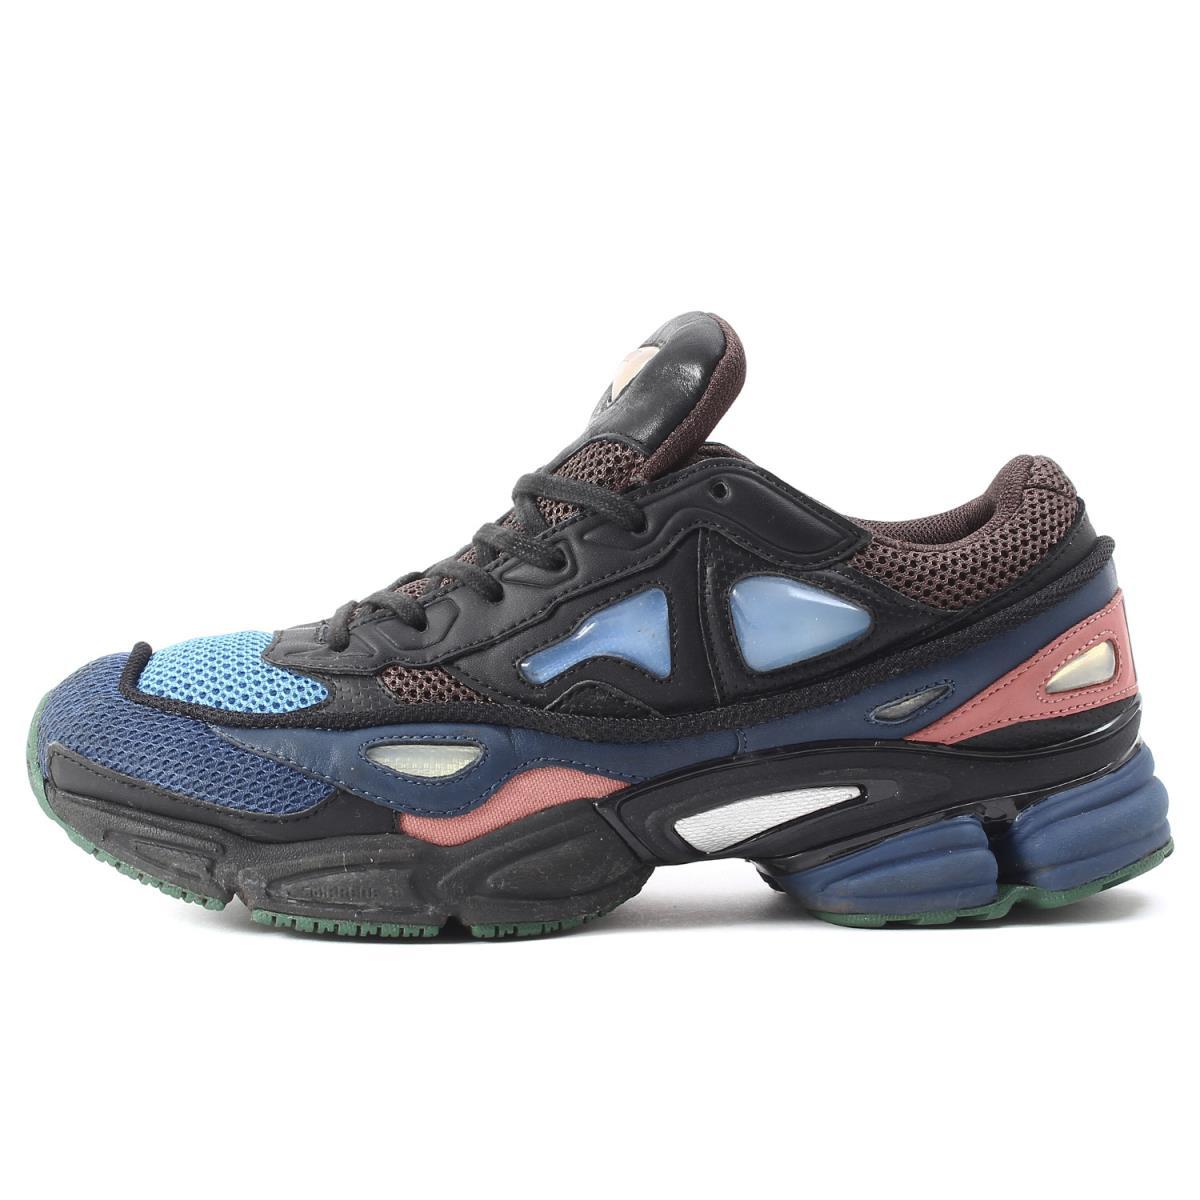 f4fab3d514e4 RAF SIMONS (rough Simmons) X adidas OZWEEGO II(S76451) オズウィーゴ 2 sneakers  black US8.5(26.5cm)